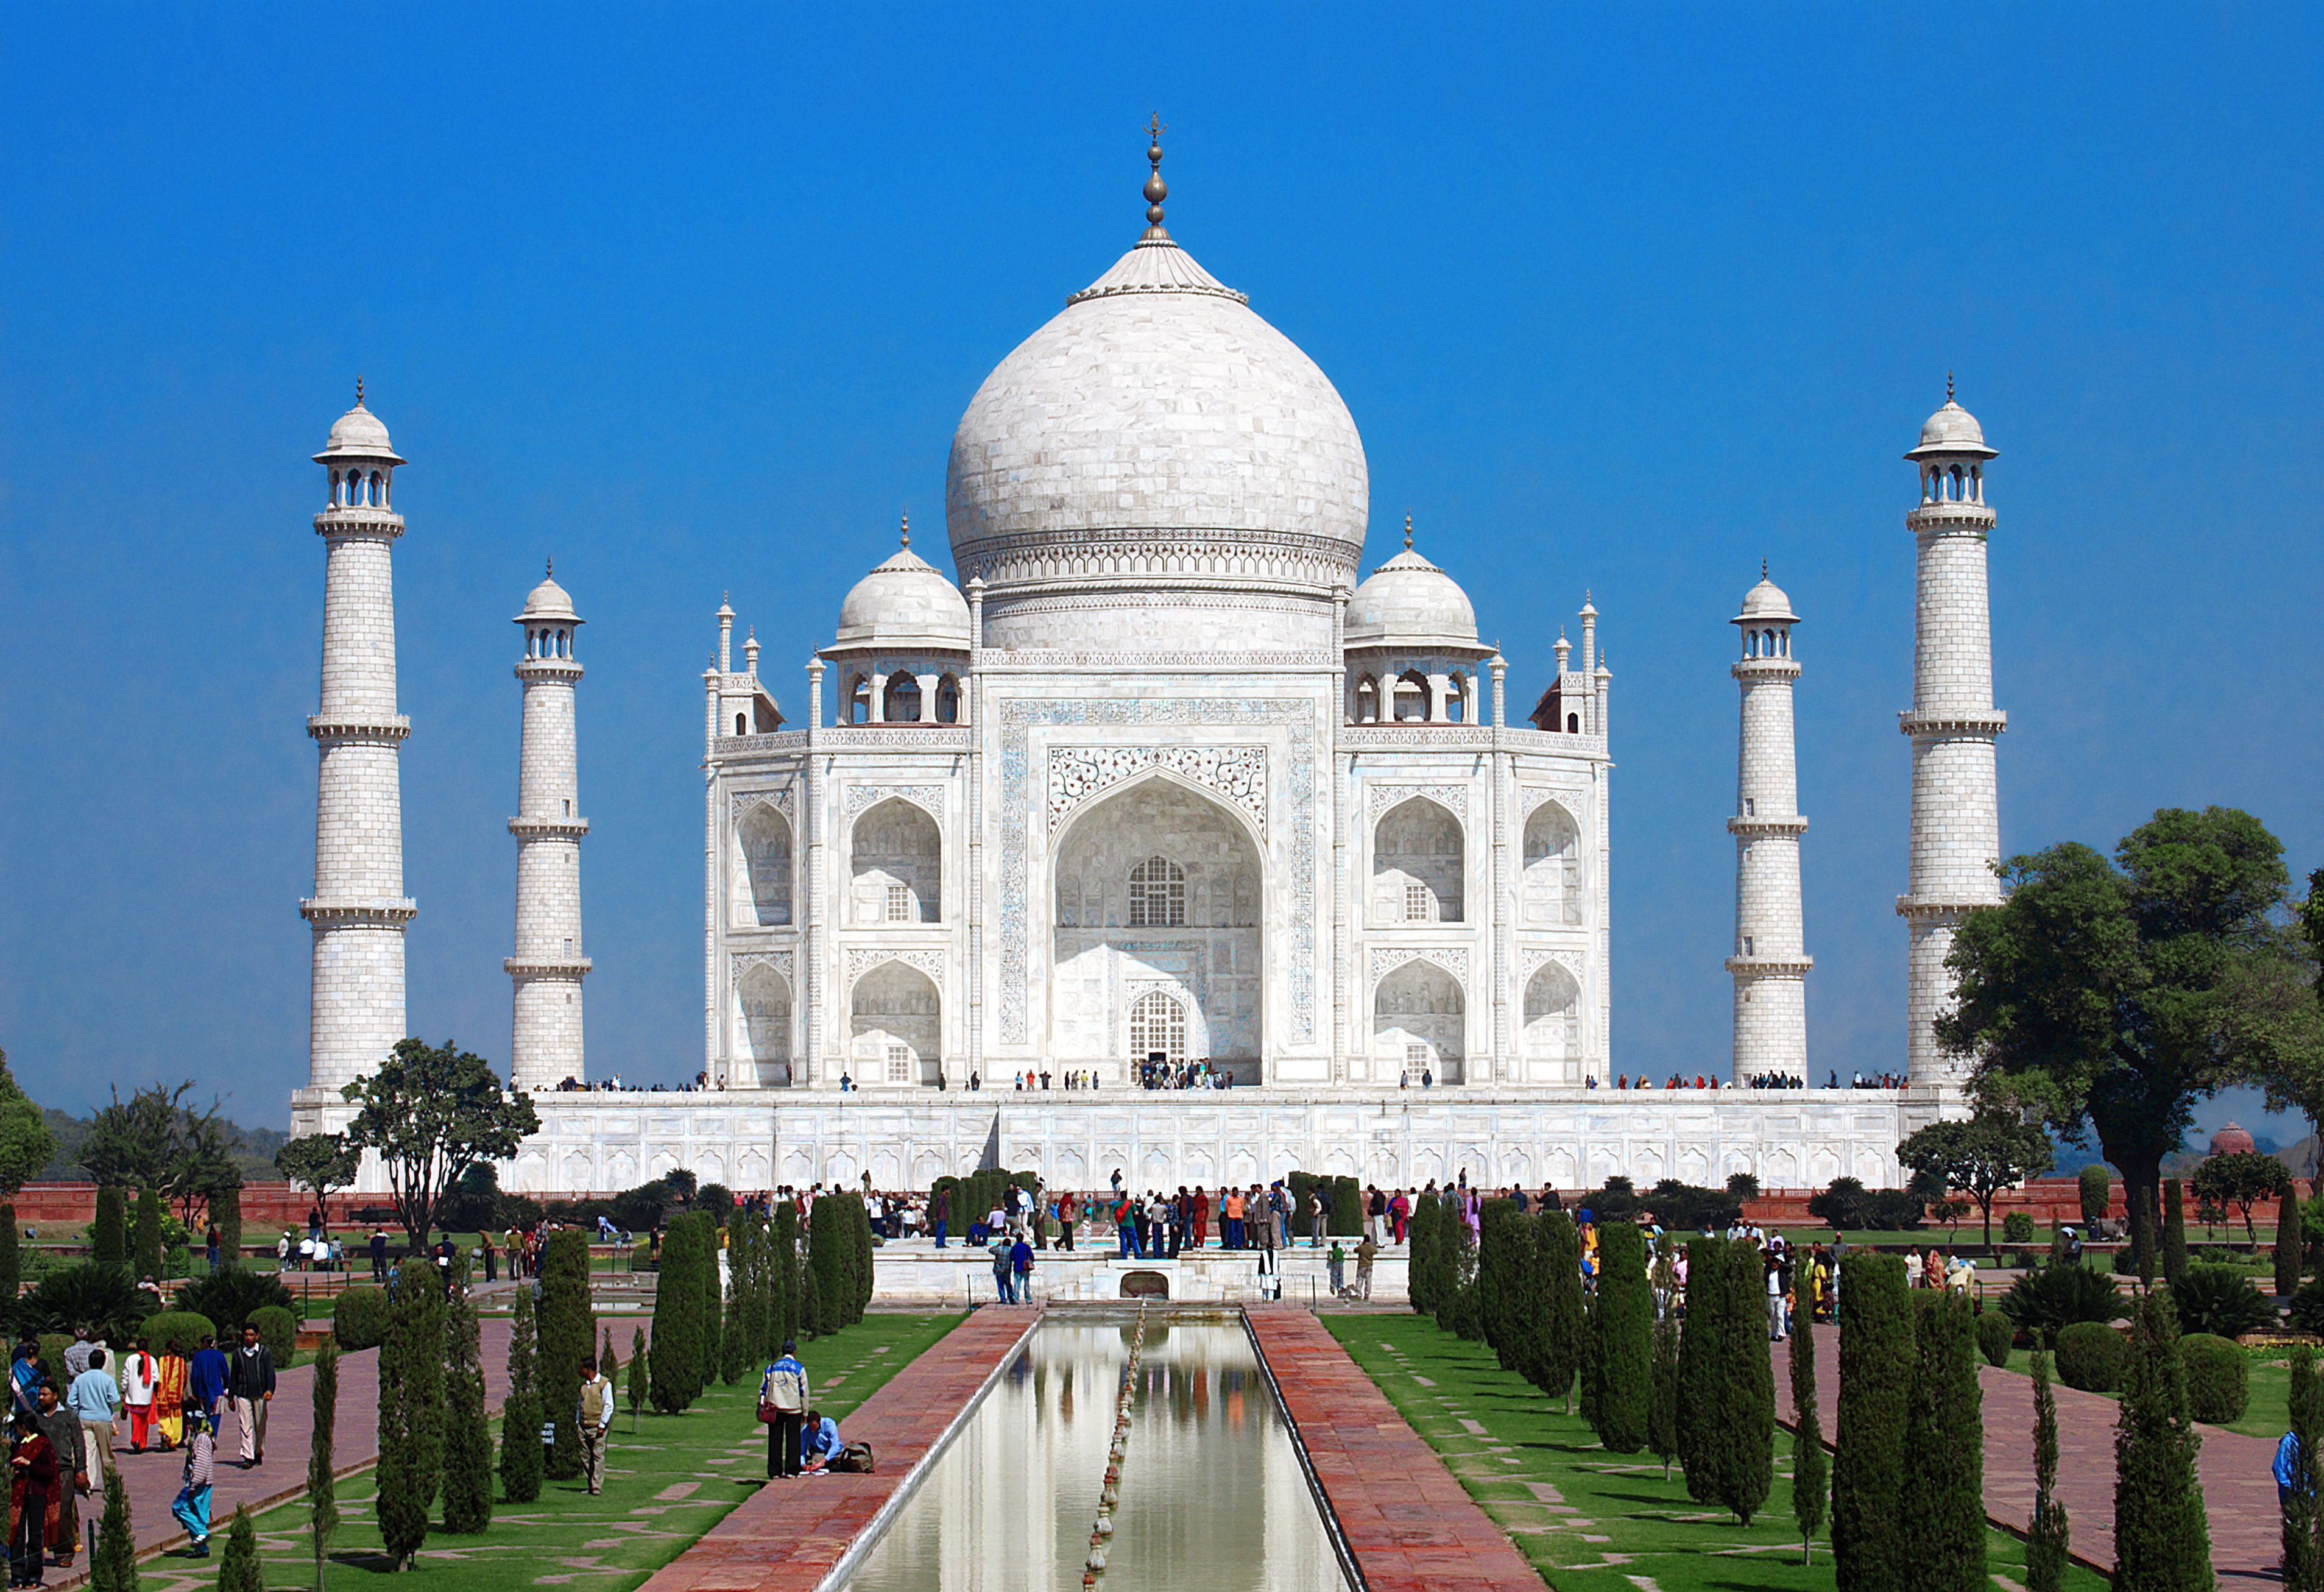 Bright white ivory marble of the Taj Mahal in India, symmetrical photo